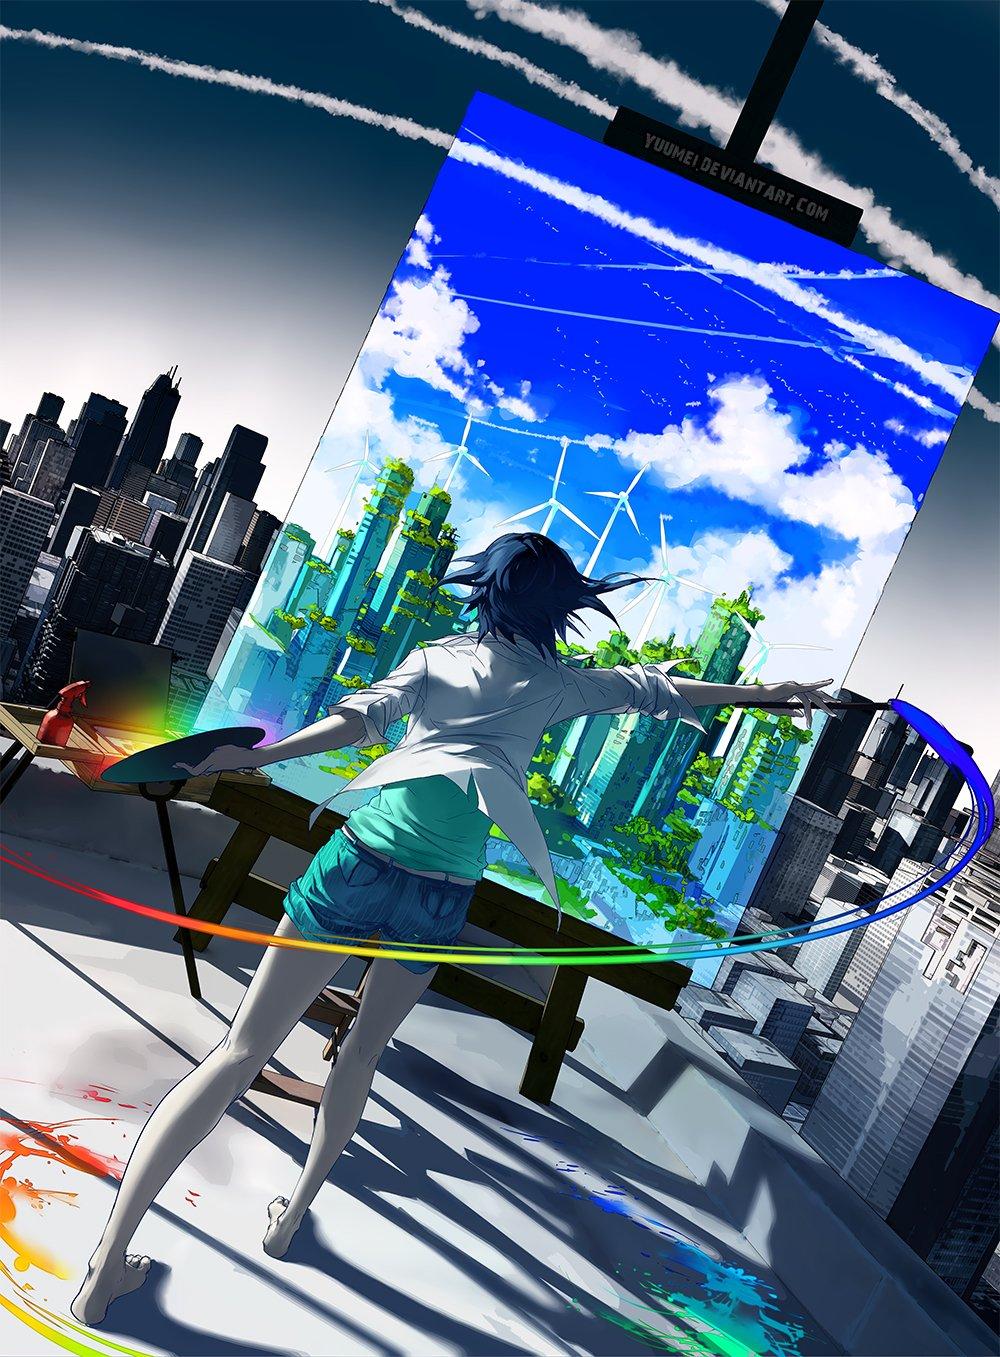 Art Yuumei и ее легкий сюрреализм - Изображение 14